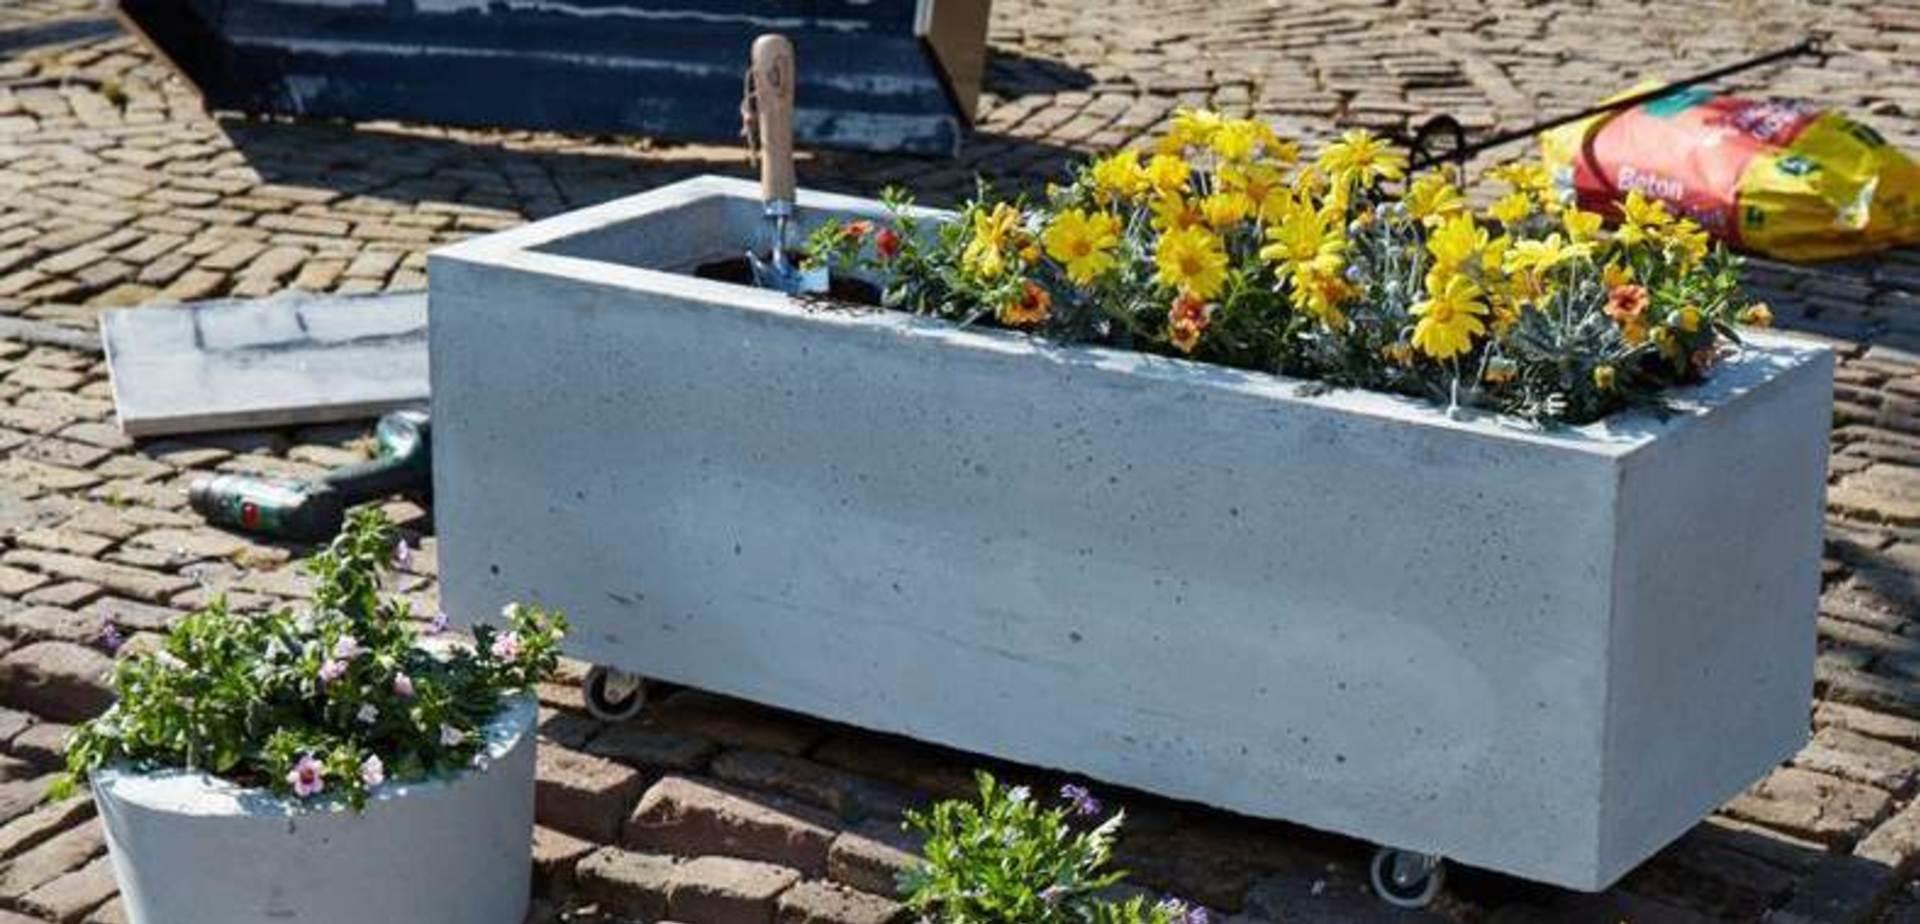 Plantenbak van beton maken - Construire jardiniere beton ...